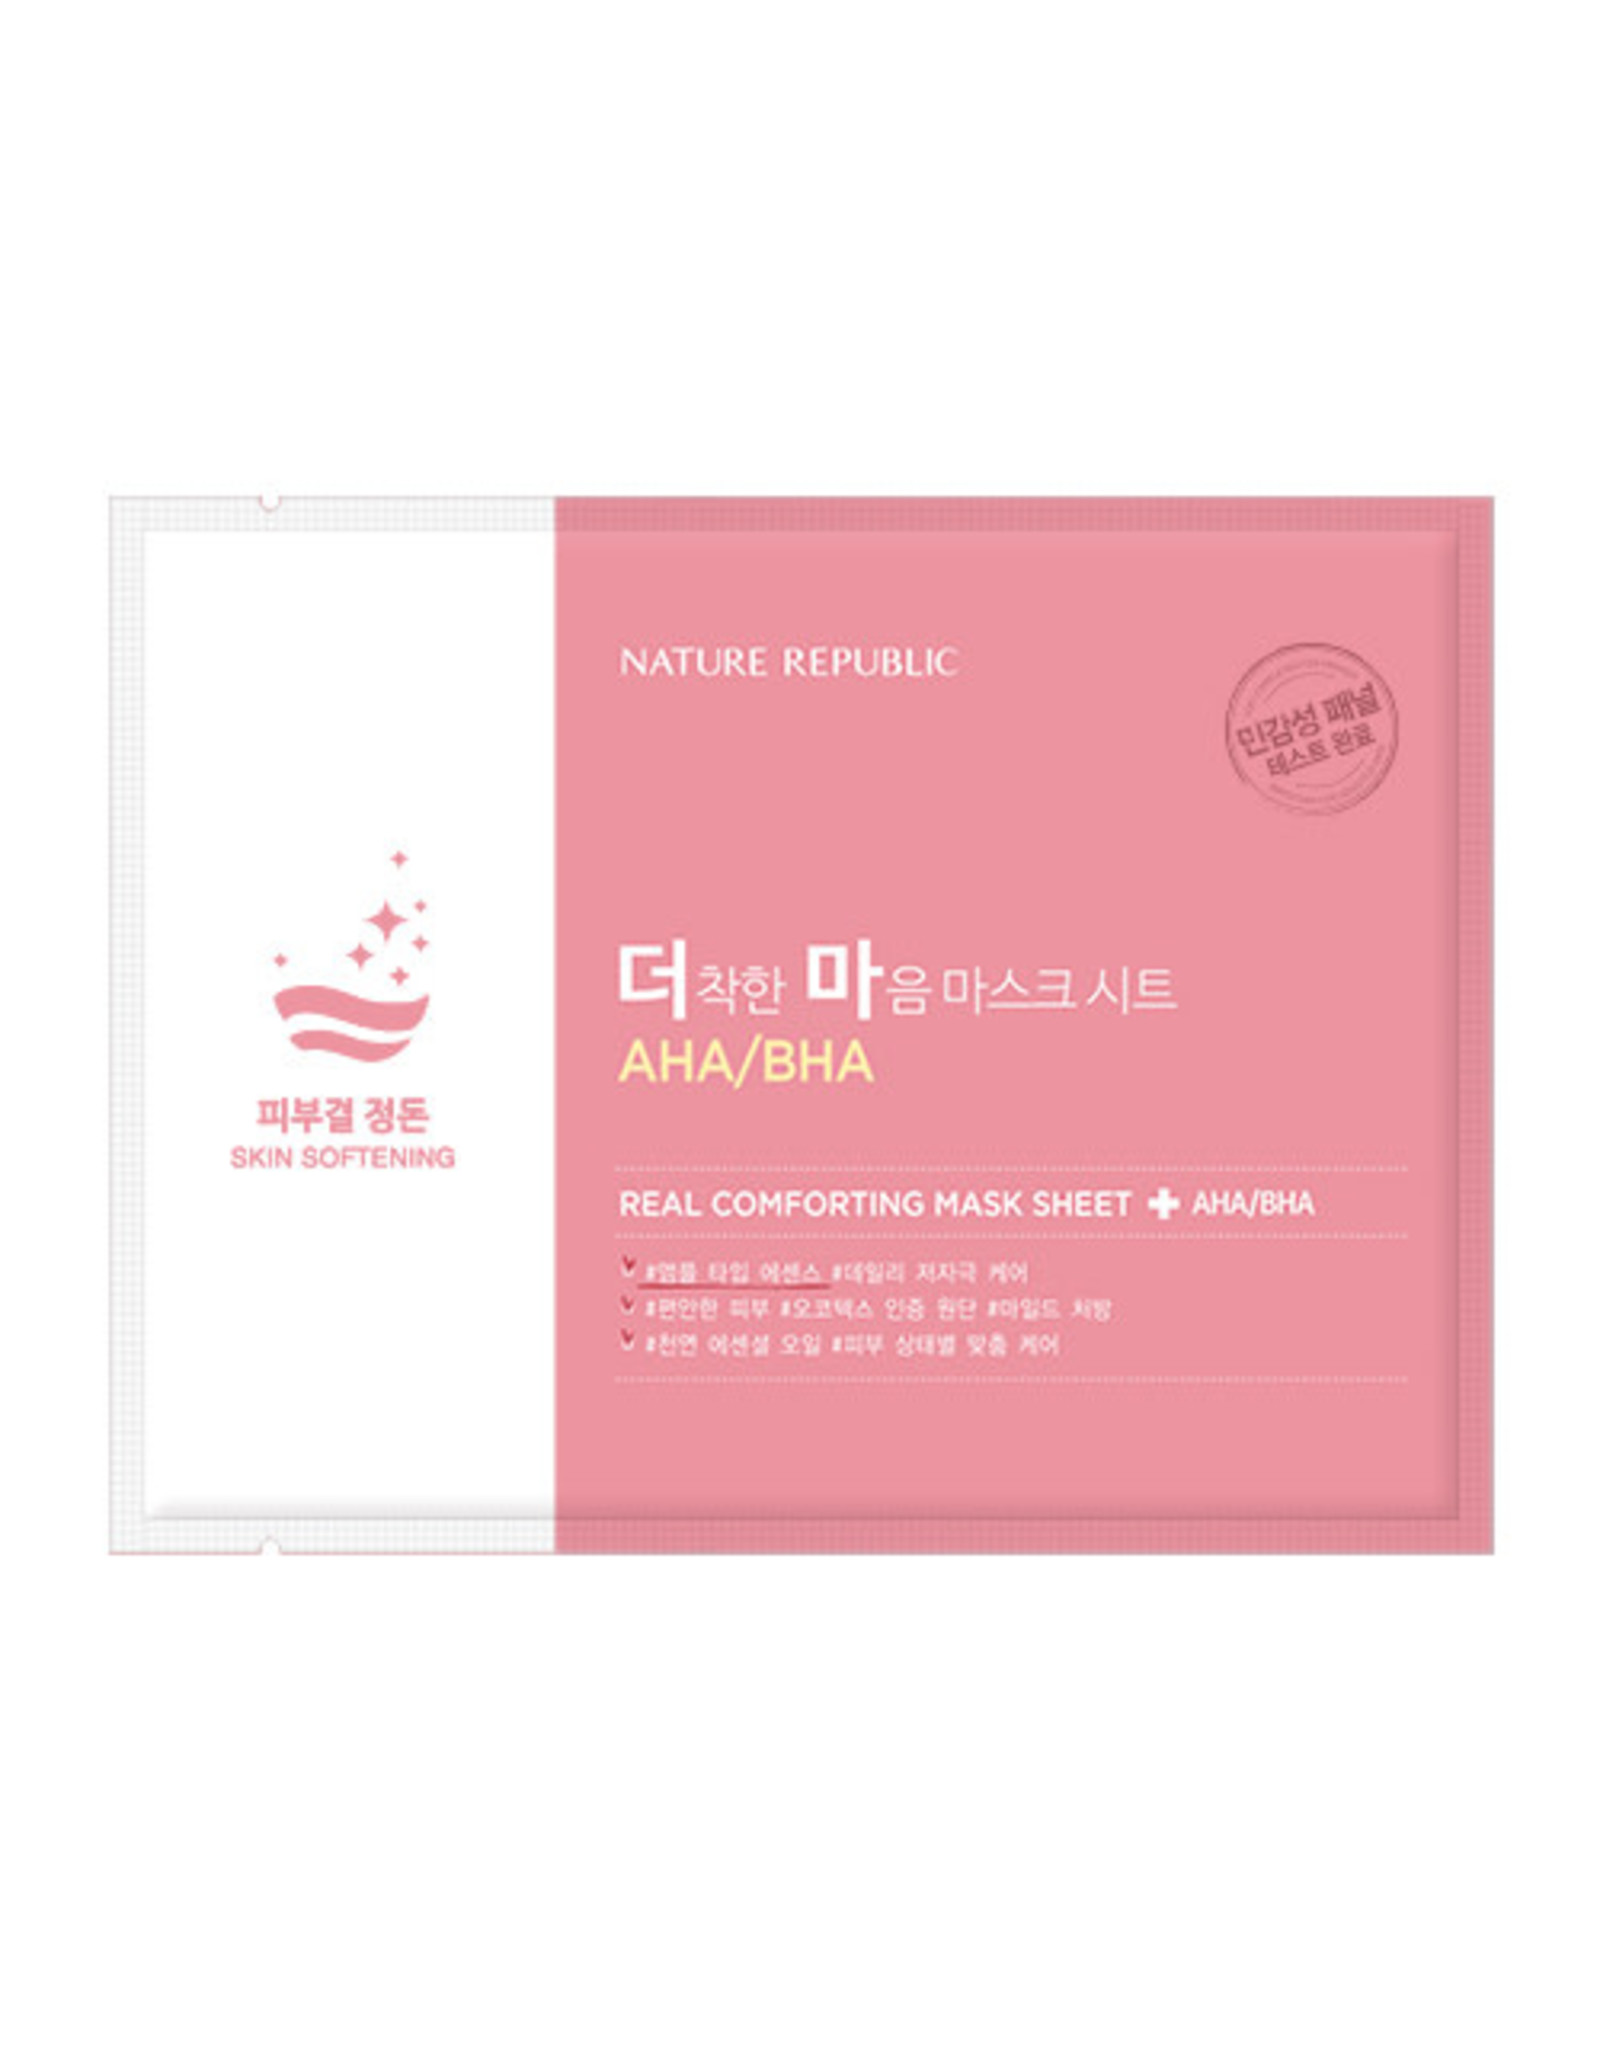 Real Comforting Mask Sheet Aha/Bha (Orig $1.90)